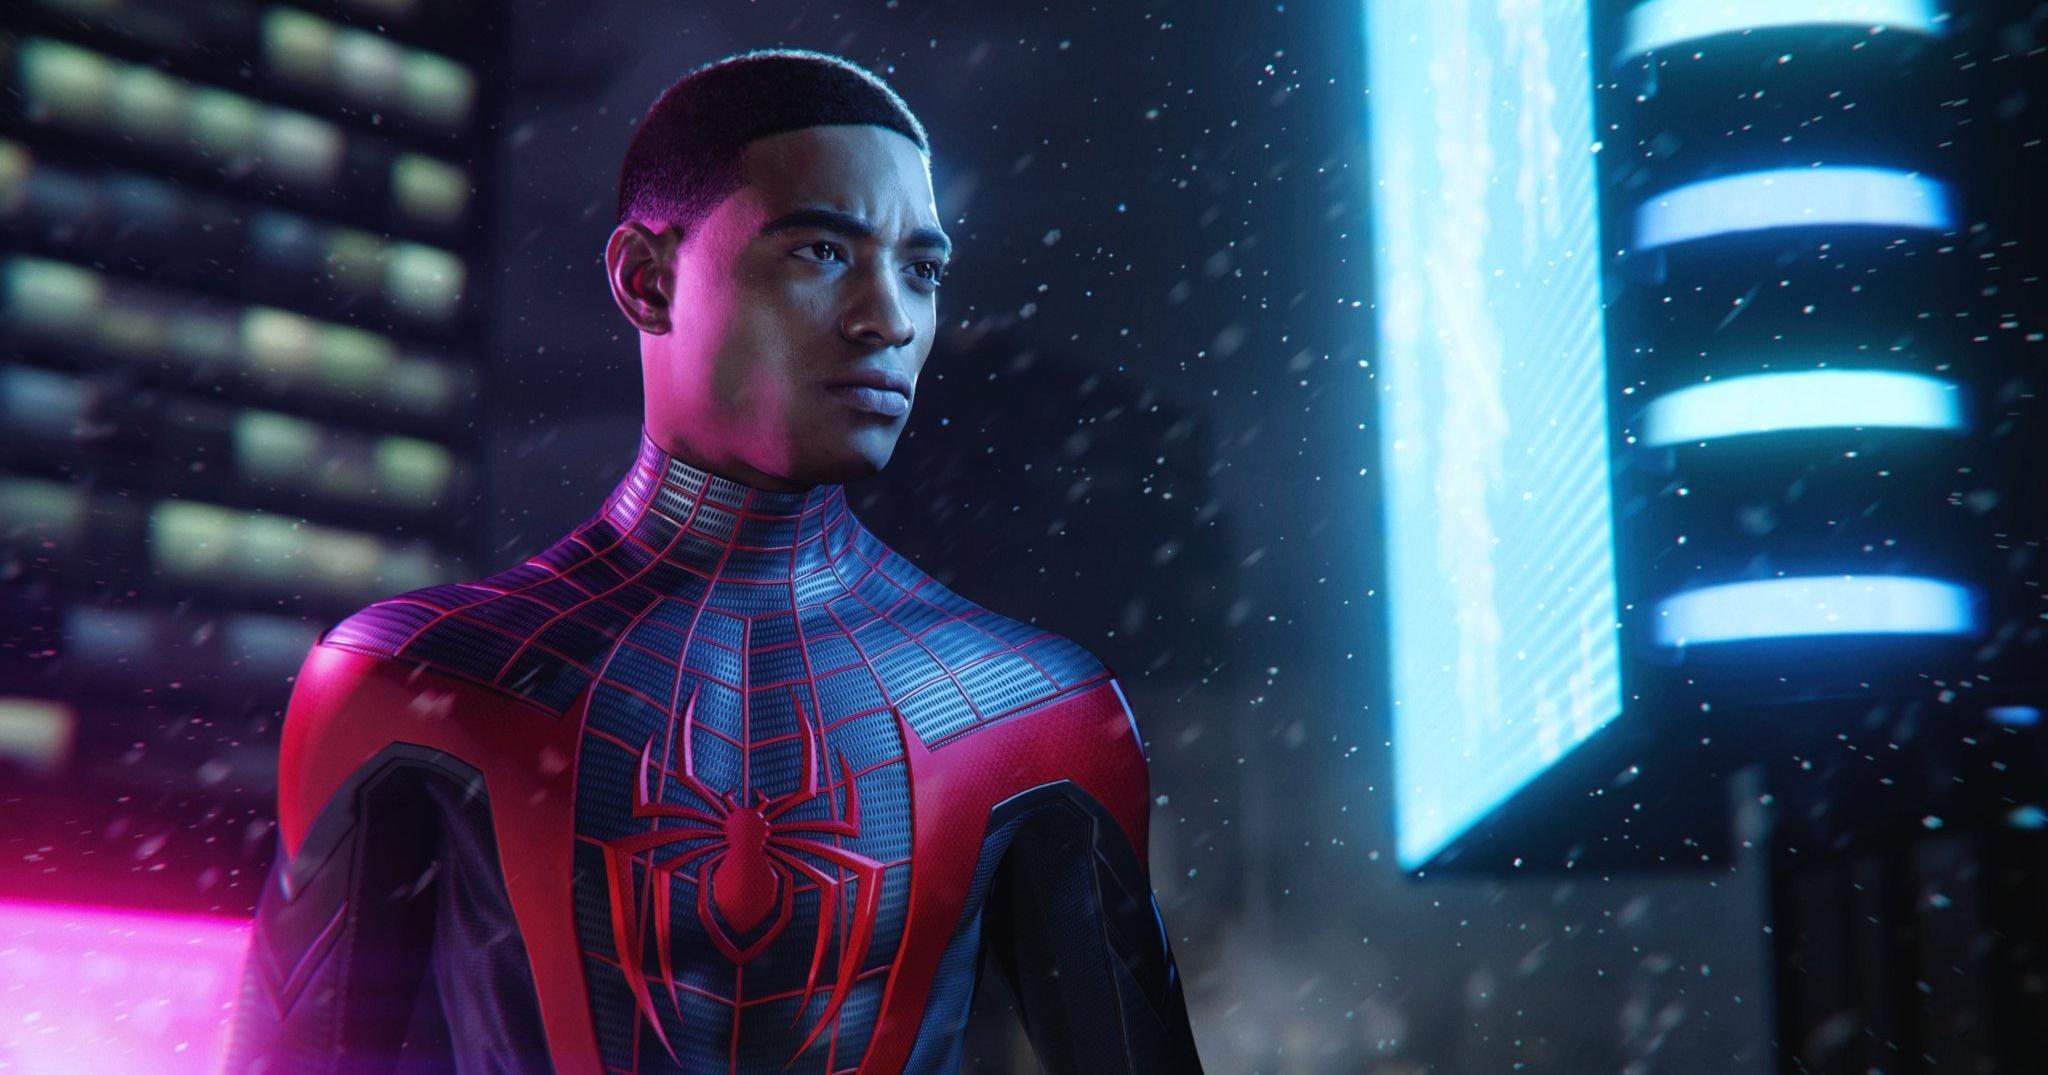 spider-man-miles-morales-screencap-1.jpg